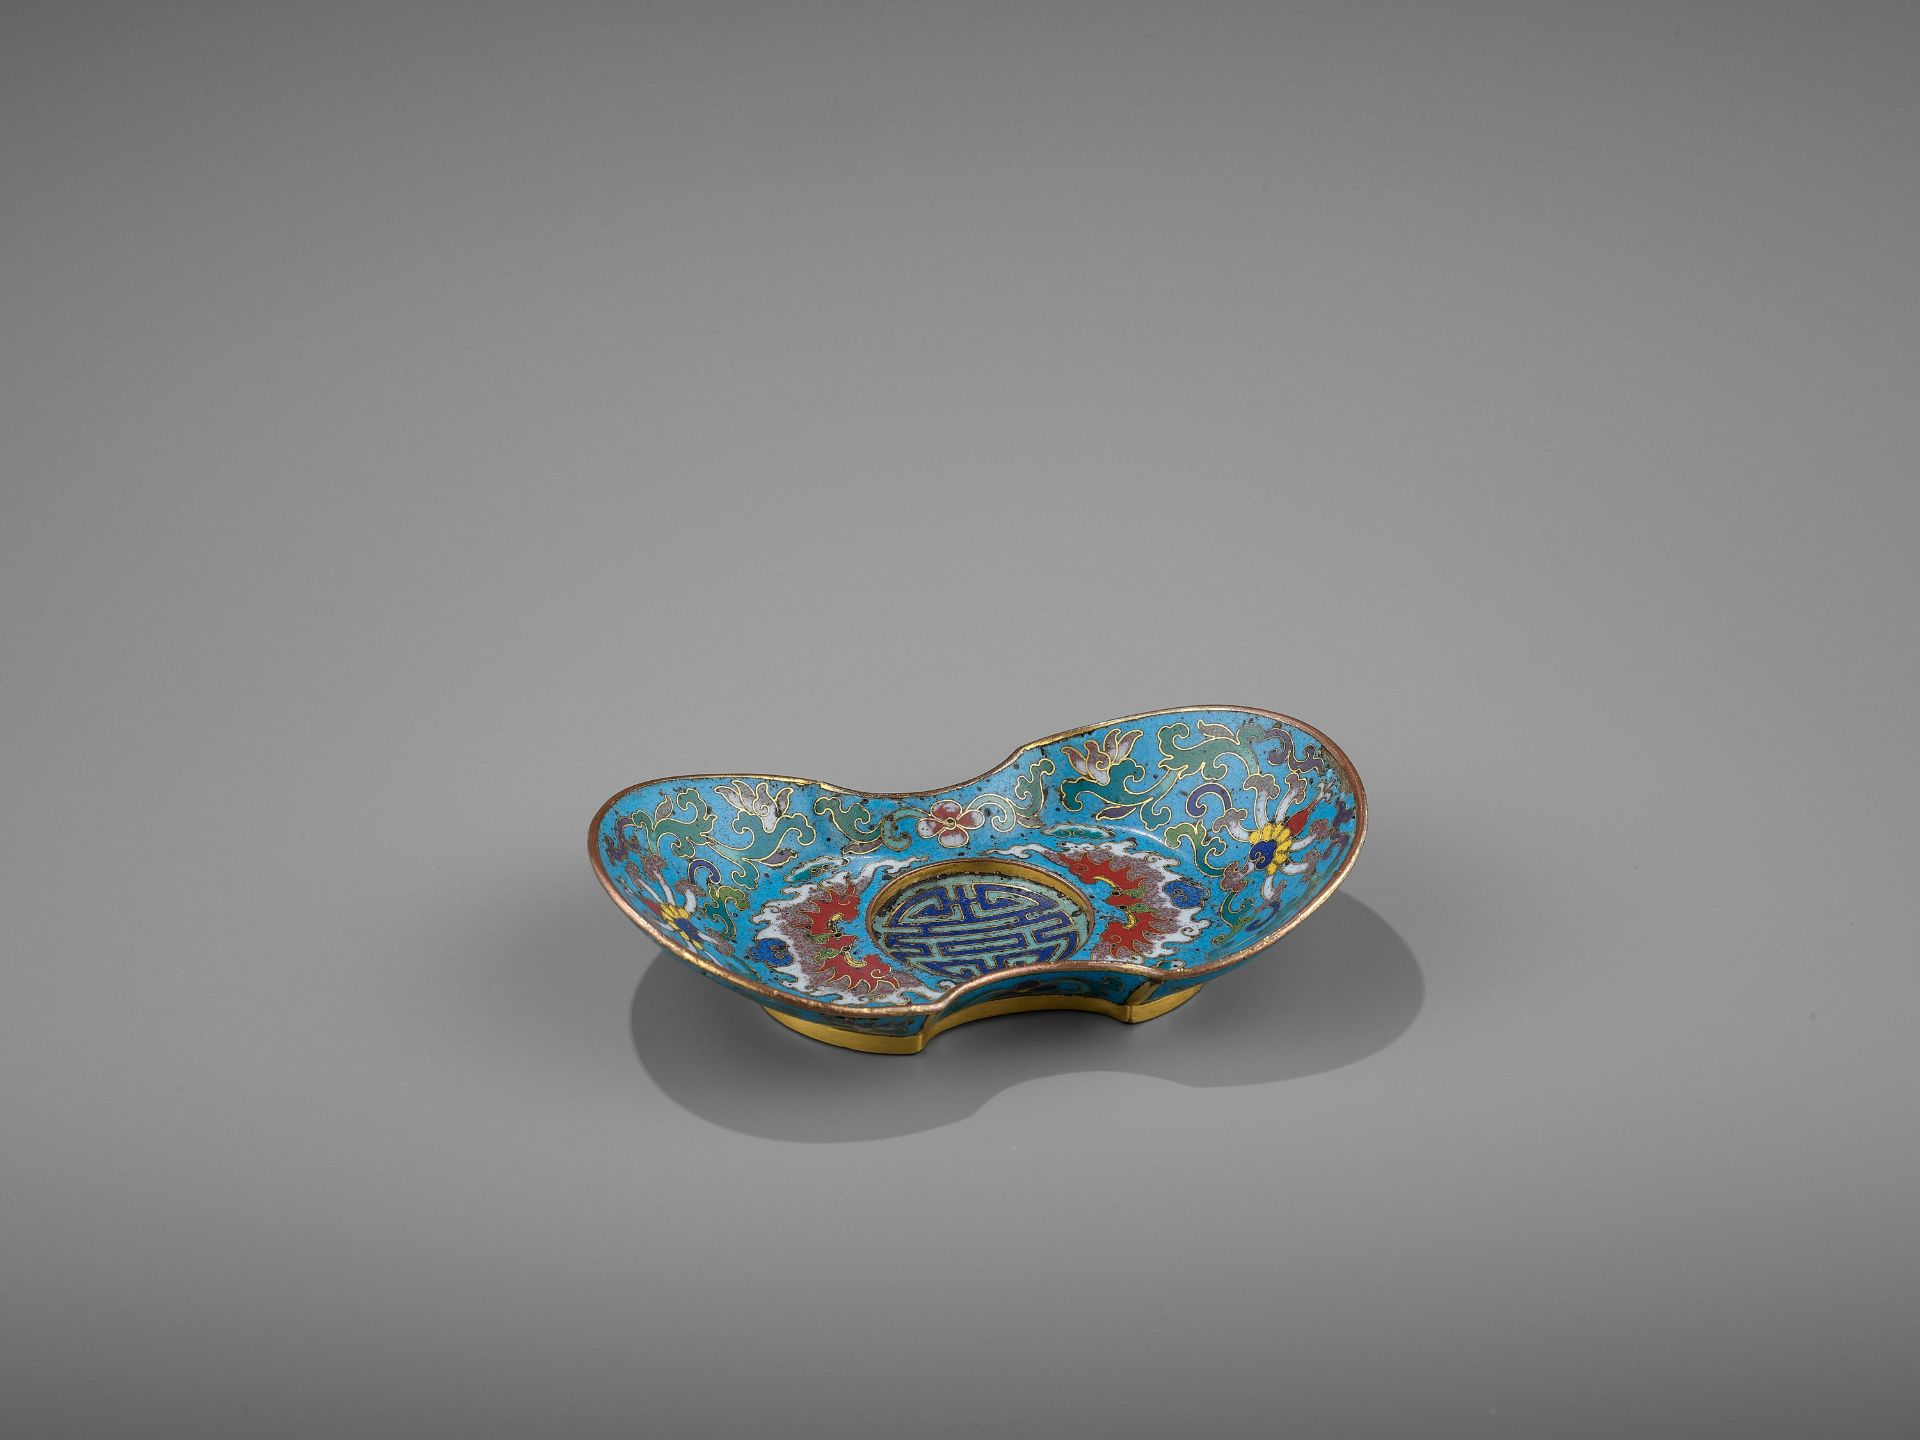 A CLOISONNE AND GILT-BRONZE 'DOUBLE HAPPINESS' CUP STAND, QIANLONG - Bild 9 aus 10